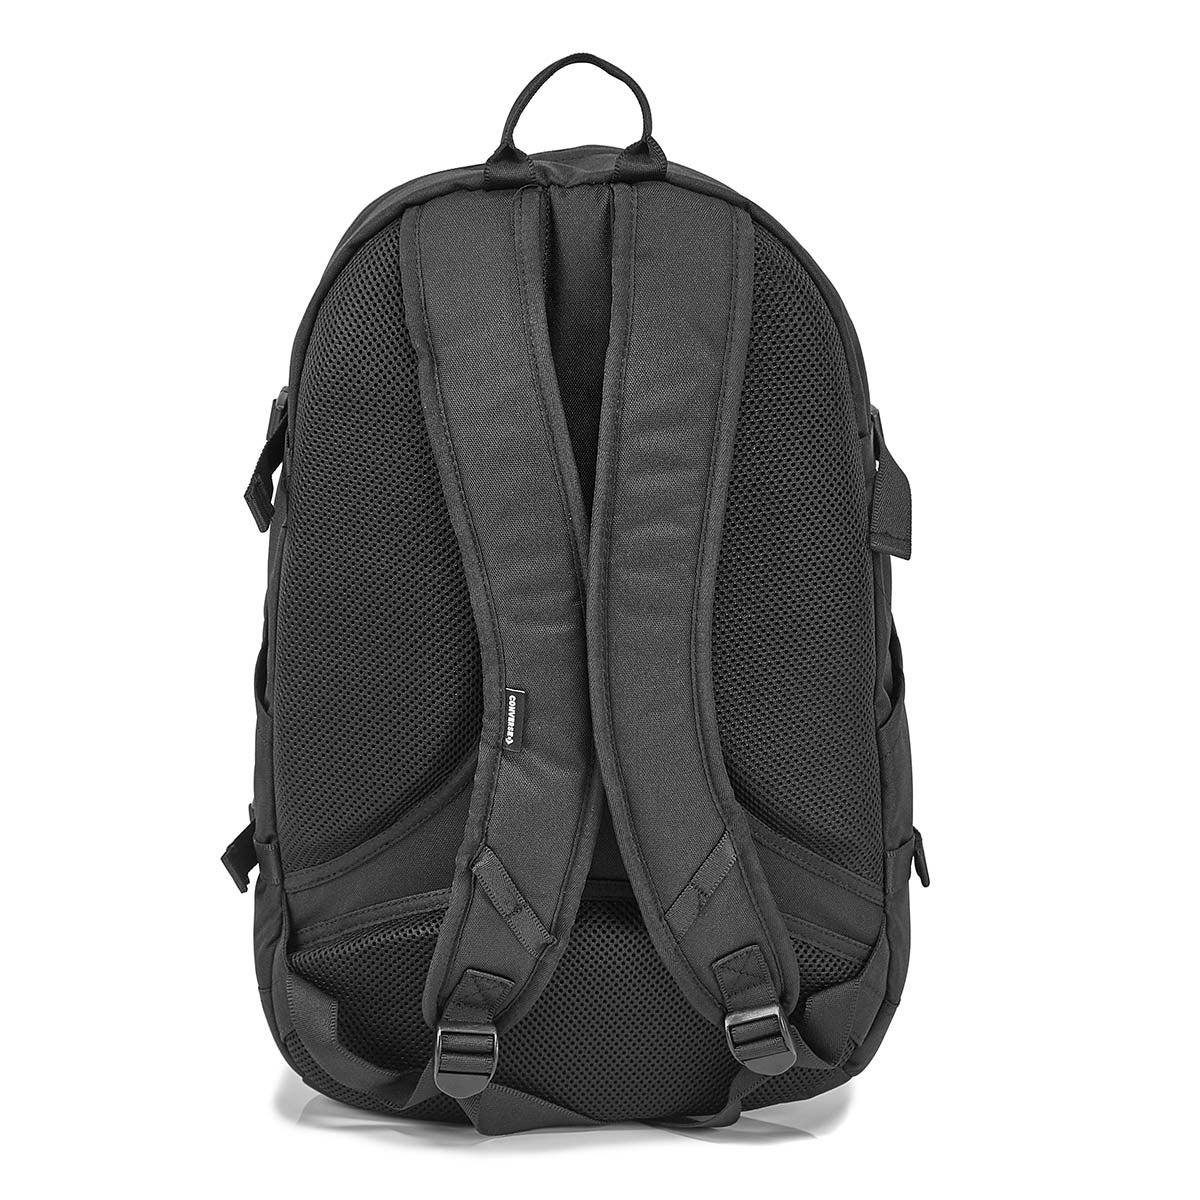 Converse STRAIGHT EDGE black backpacks